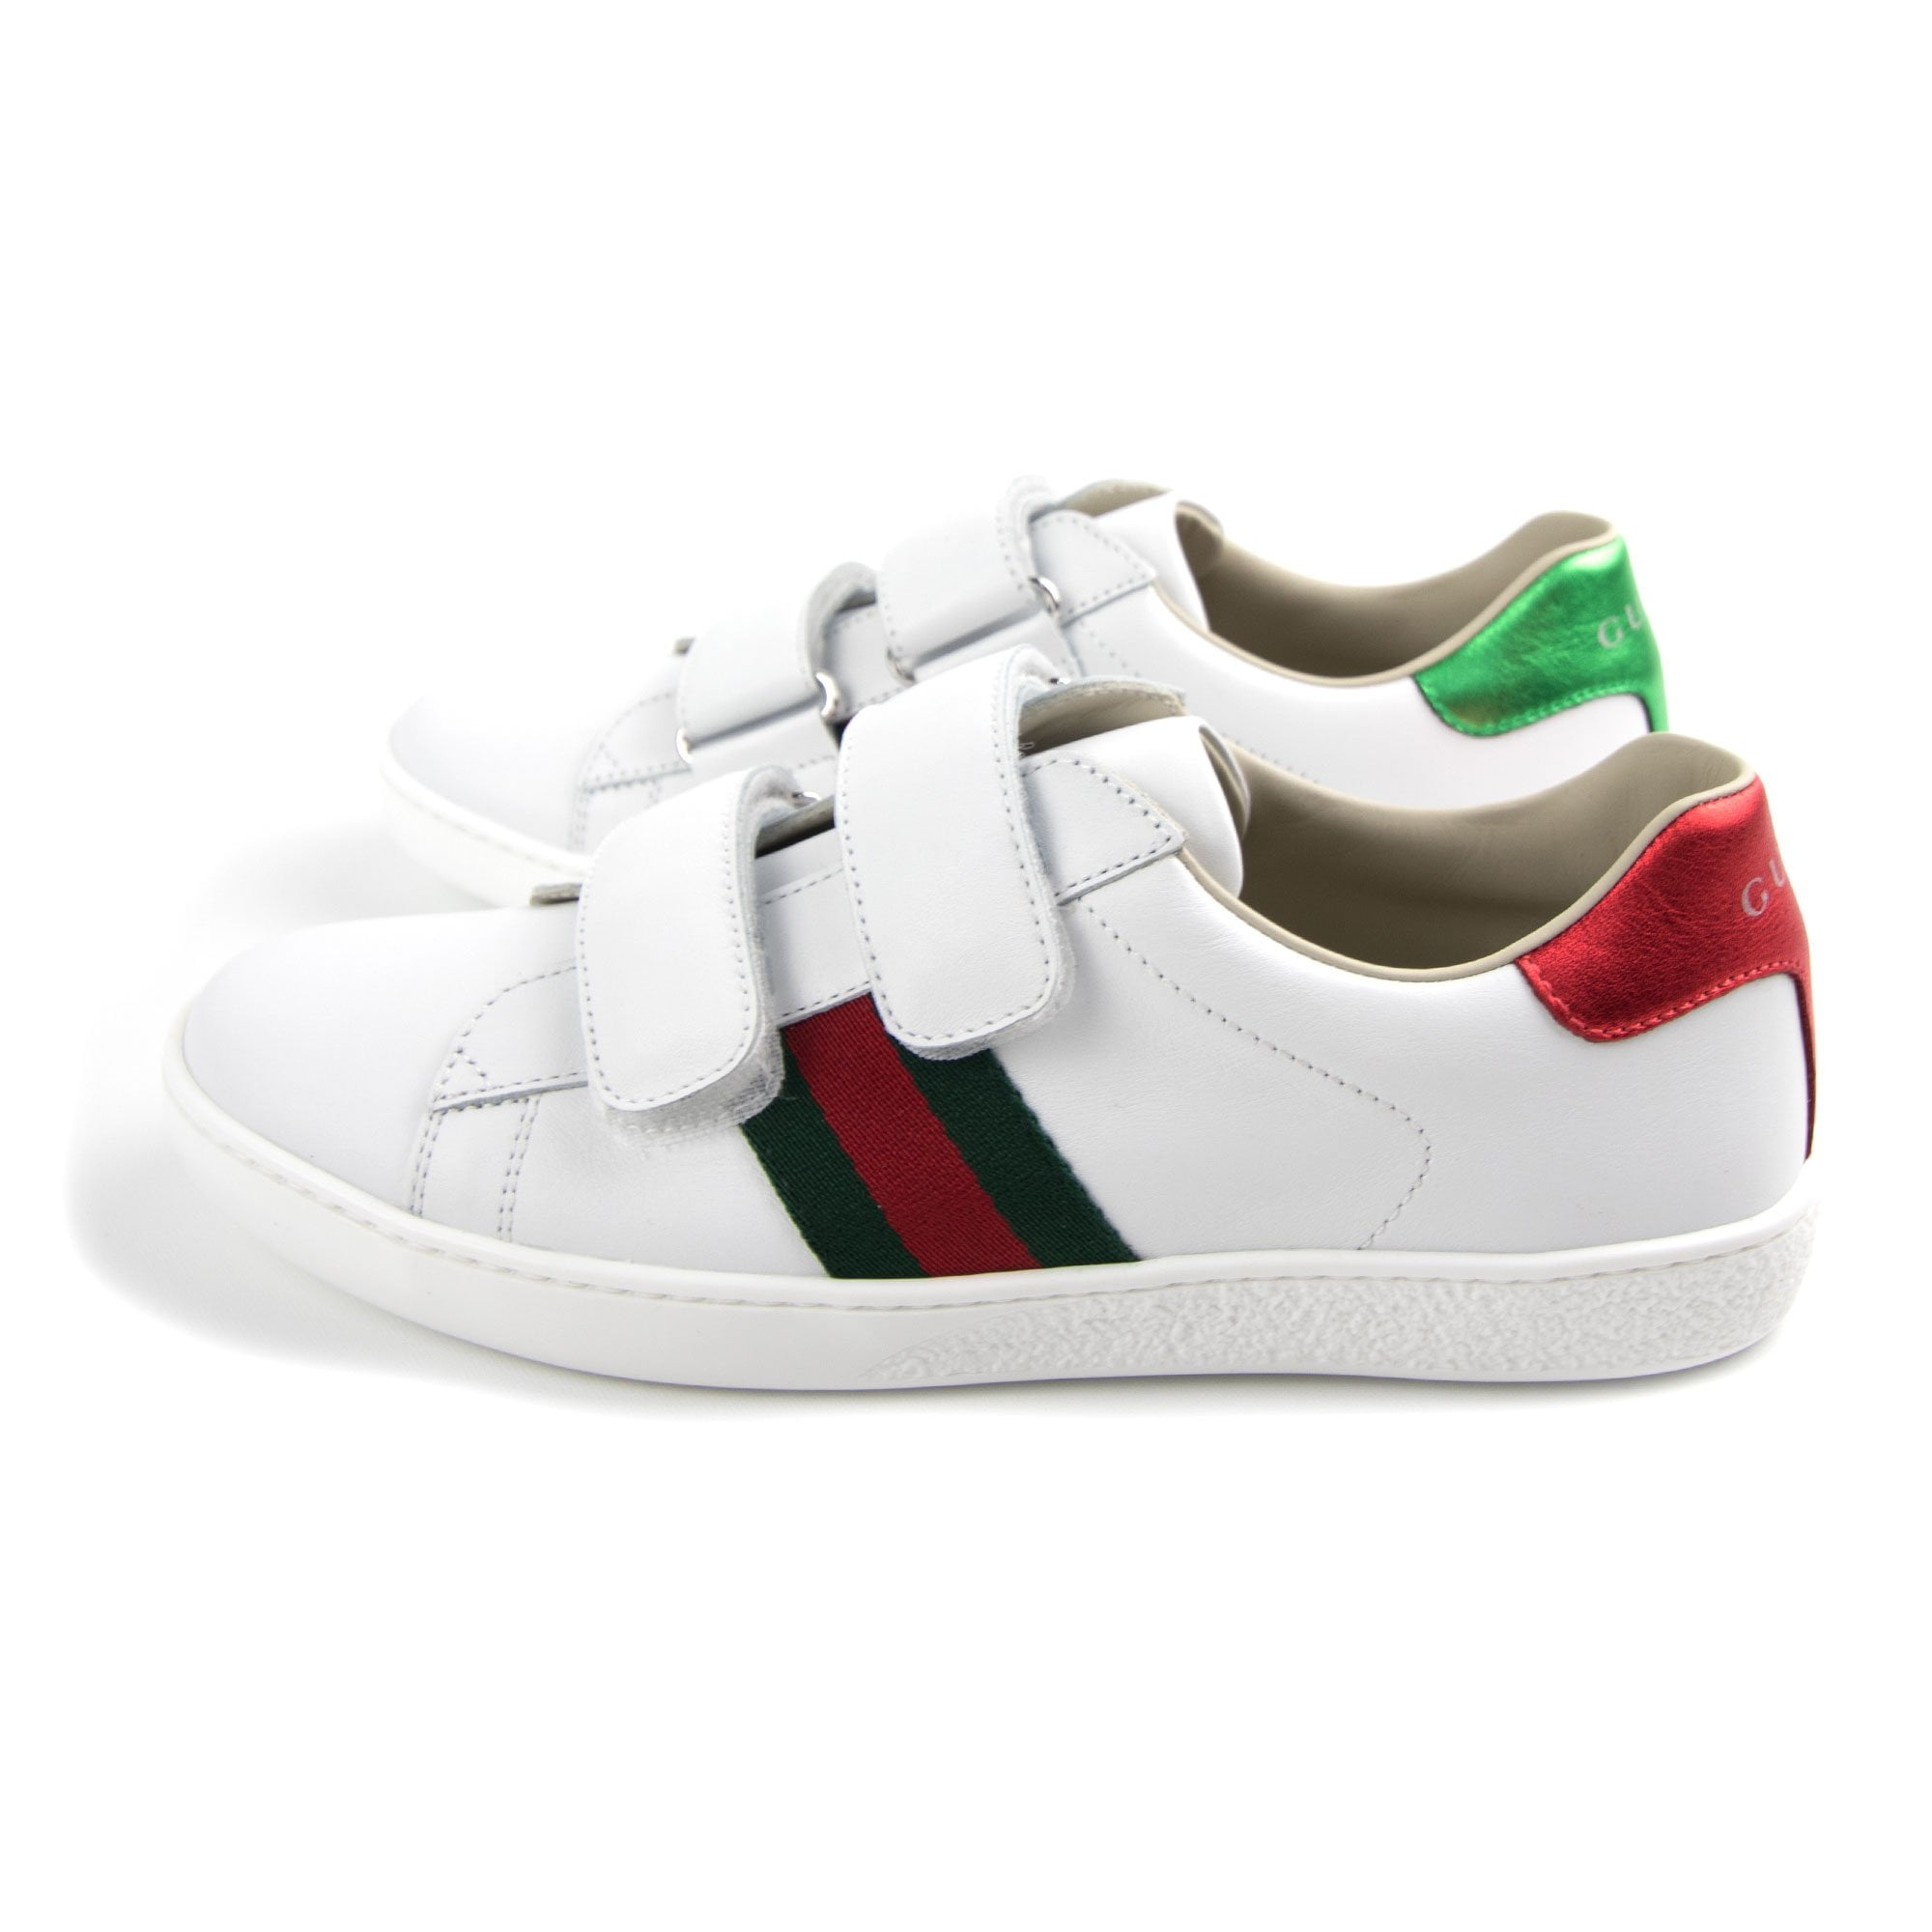 Gucci Junior Ace Leather Velcro Sneaker